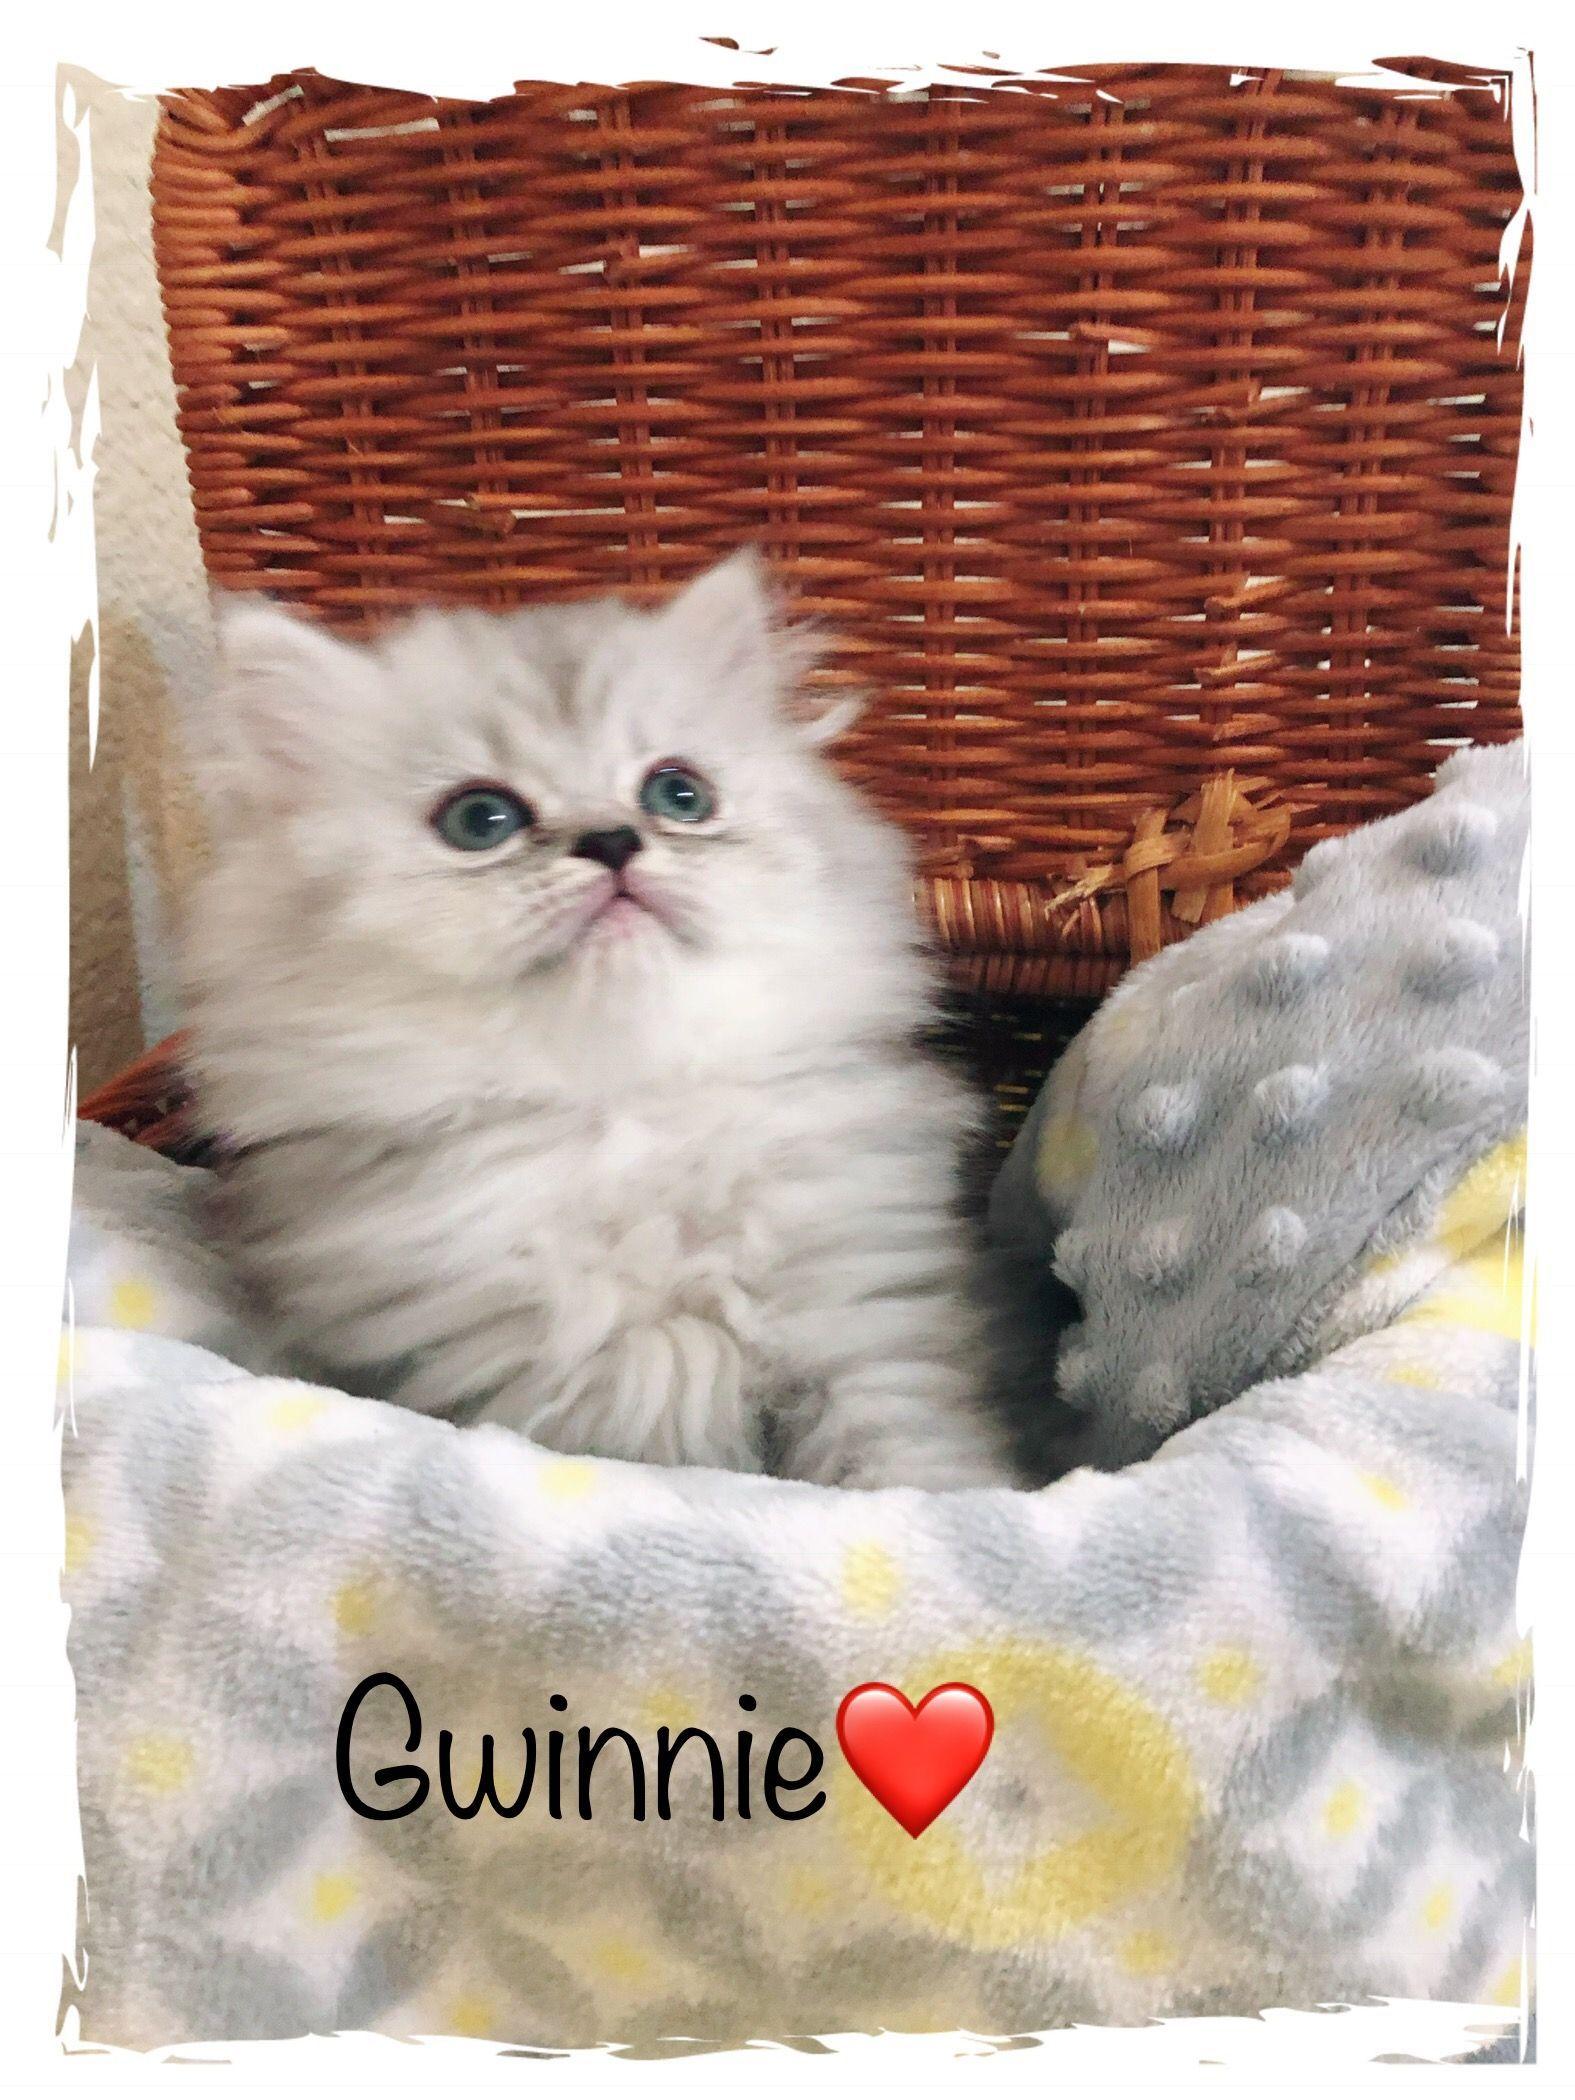 Silver persian kittens! Little Gwinnie Persiankittenpals